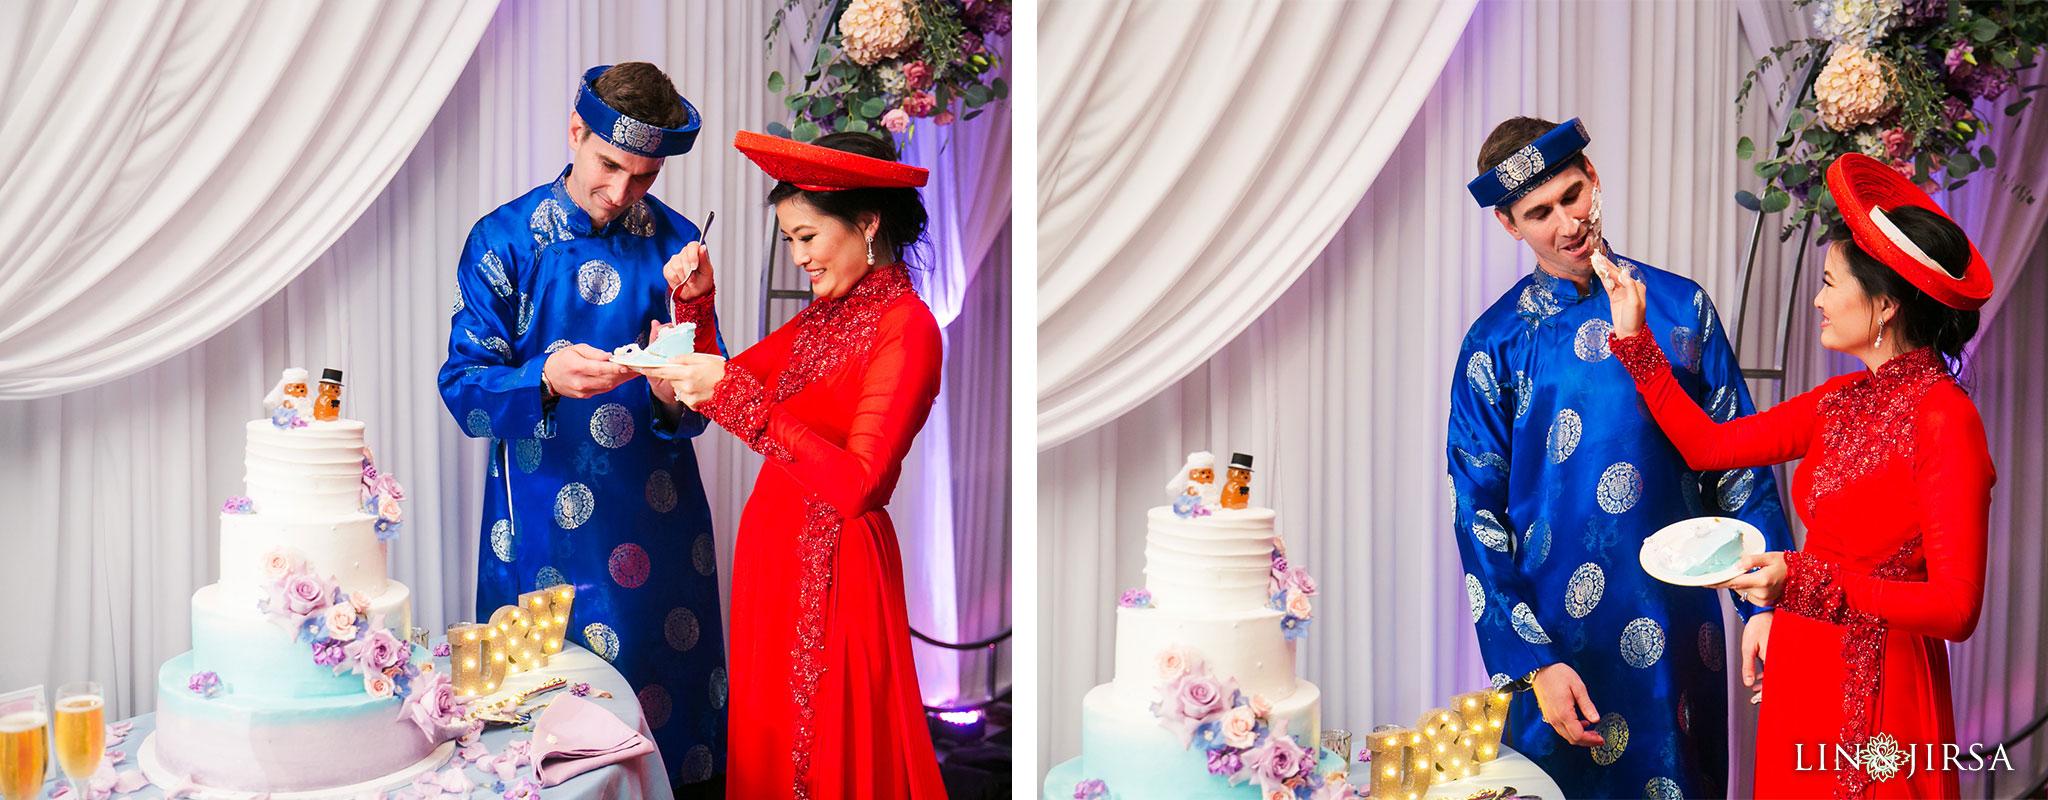 32 seacliff country club huntington beach wedding reception photography